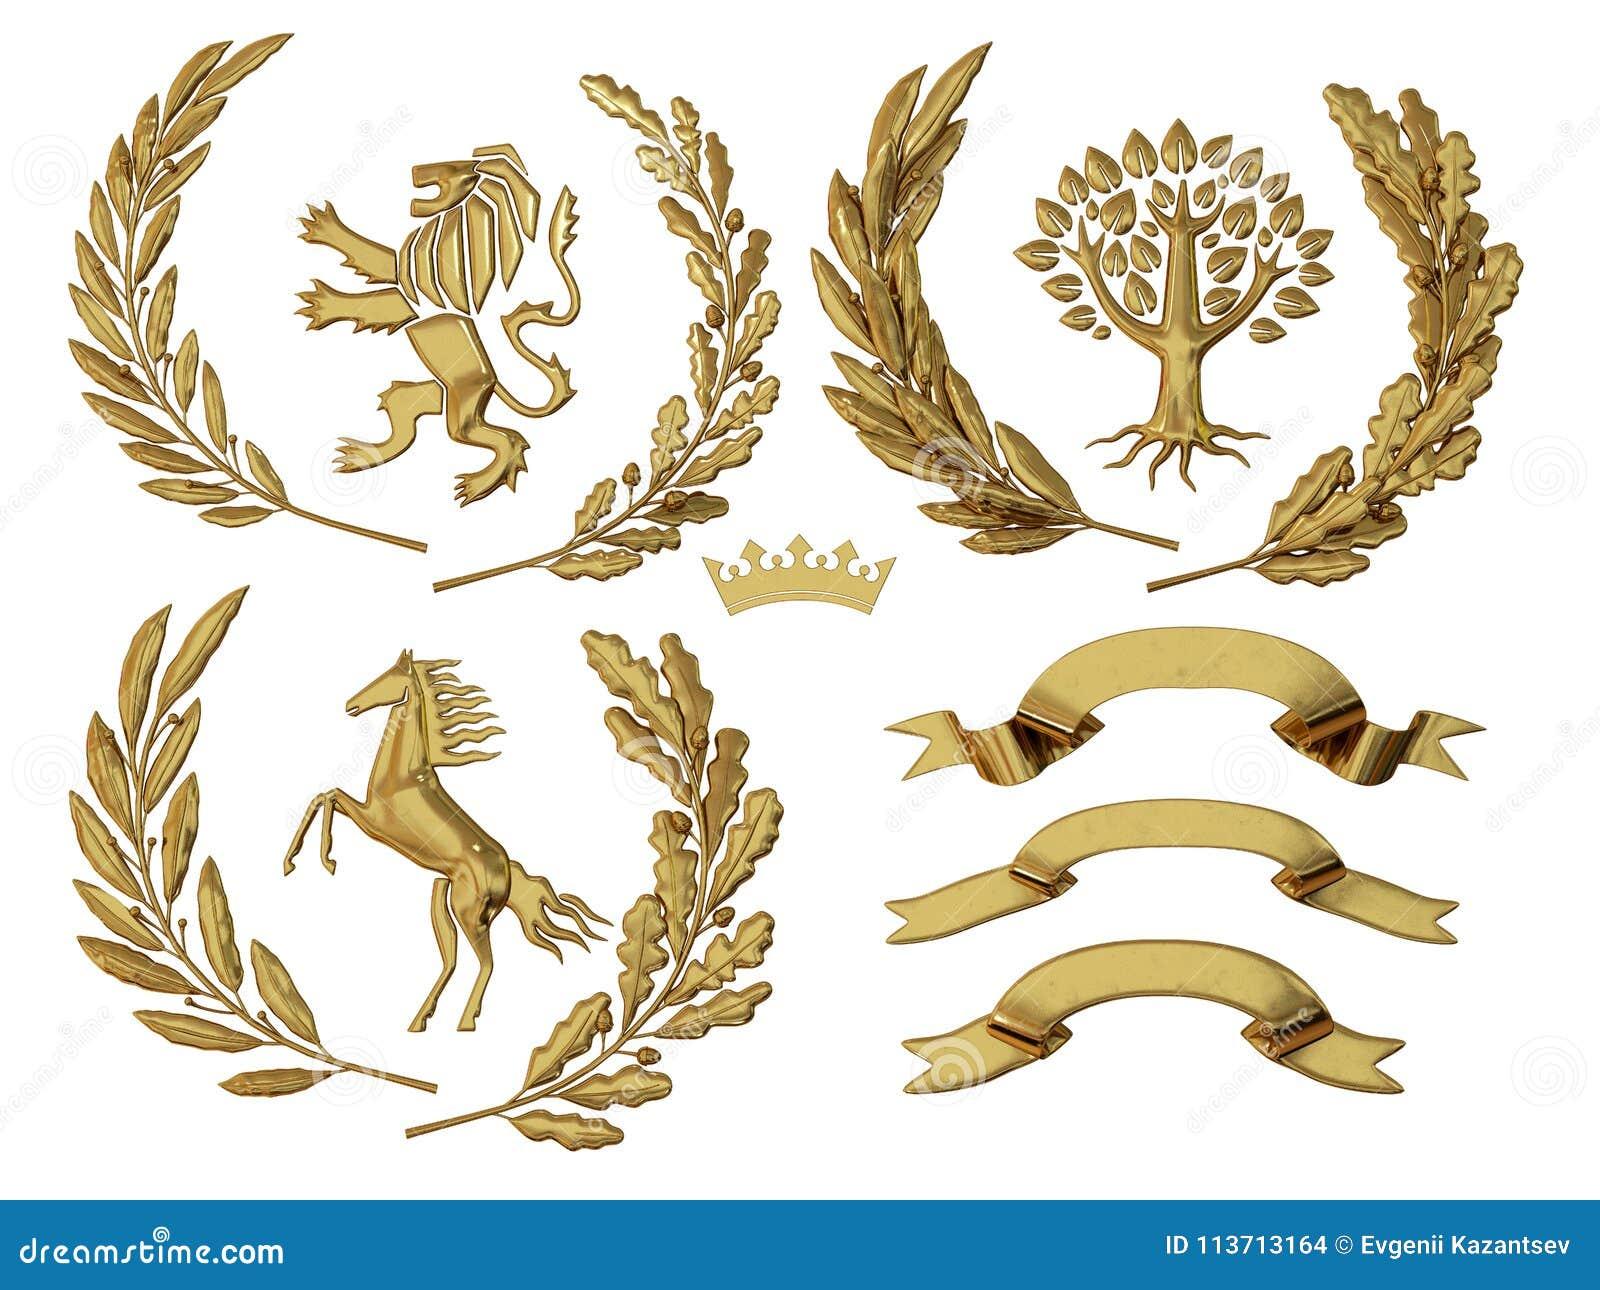 3D纹章的例证 一套对象 金黄橄榄树枝,橡木分支,冠,狮子,马,树